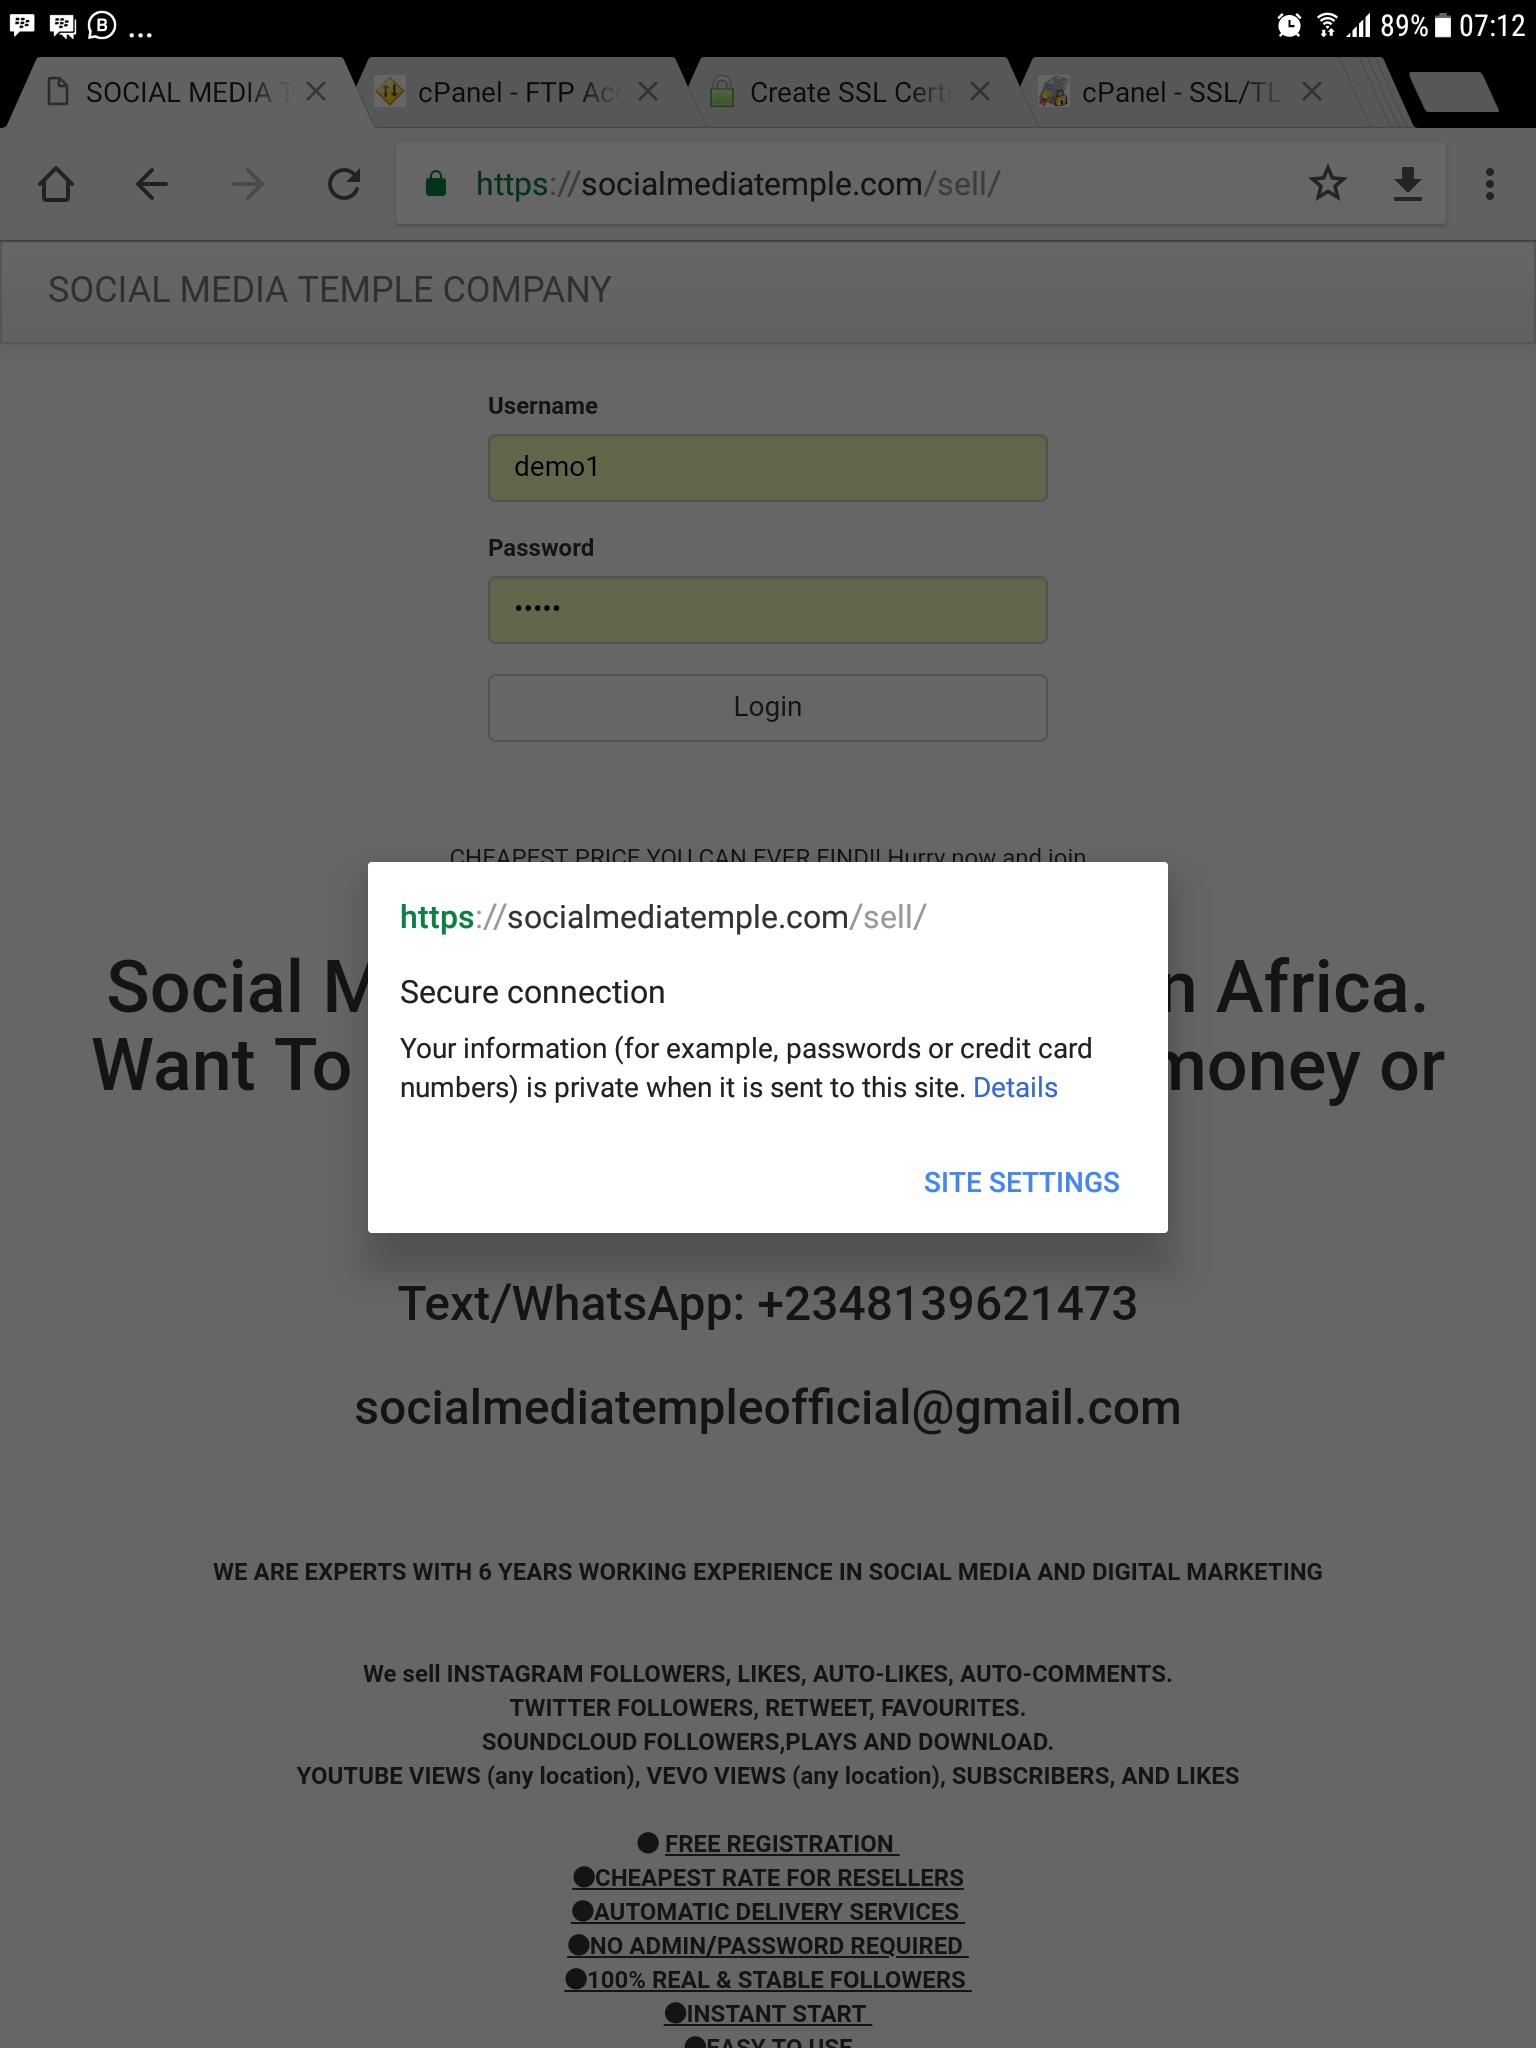 Edit my smm script and clear error